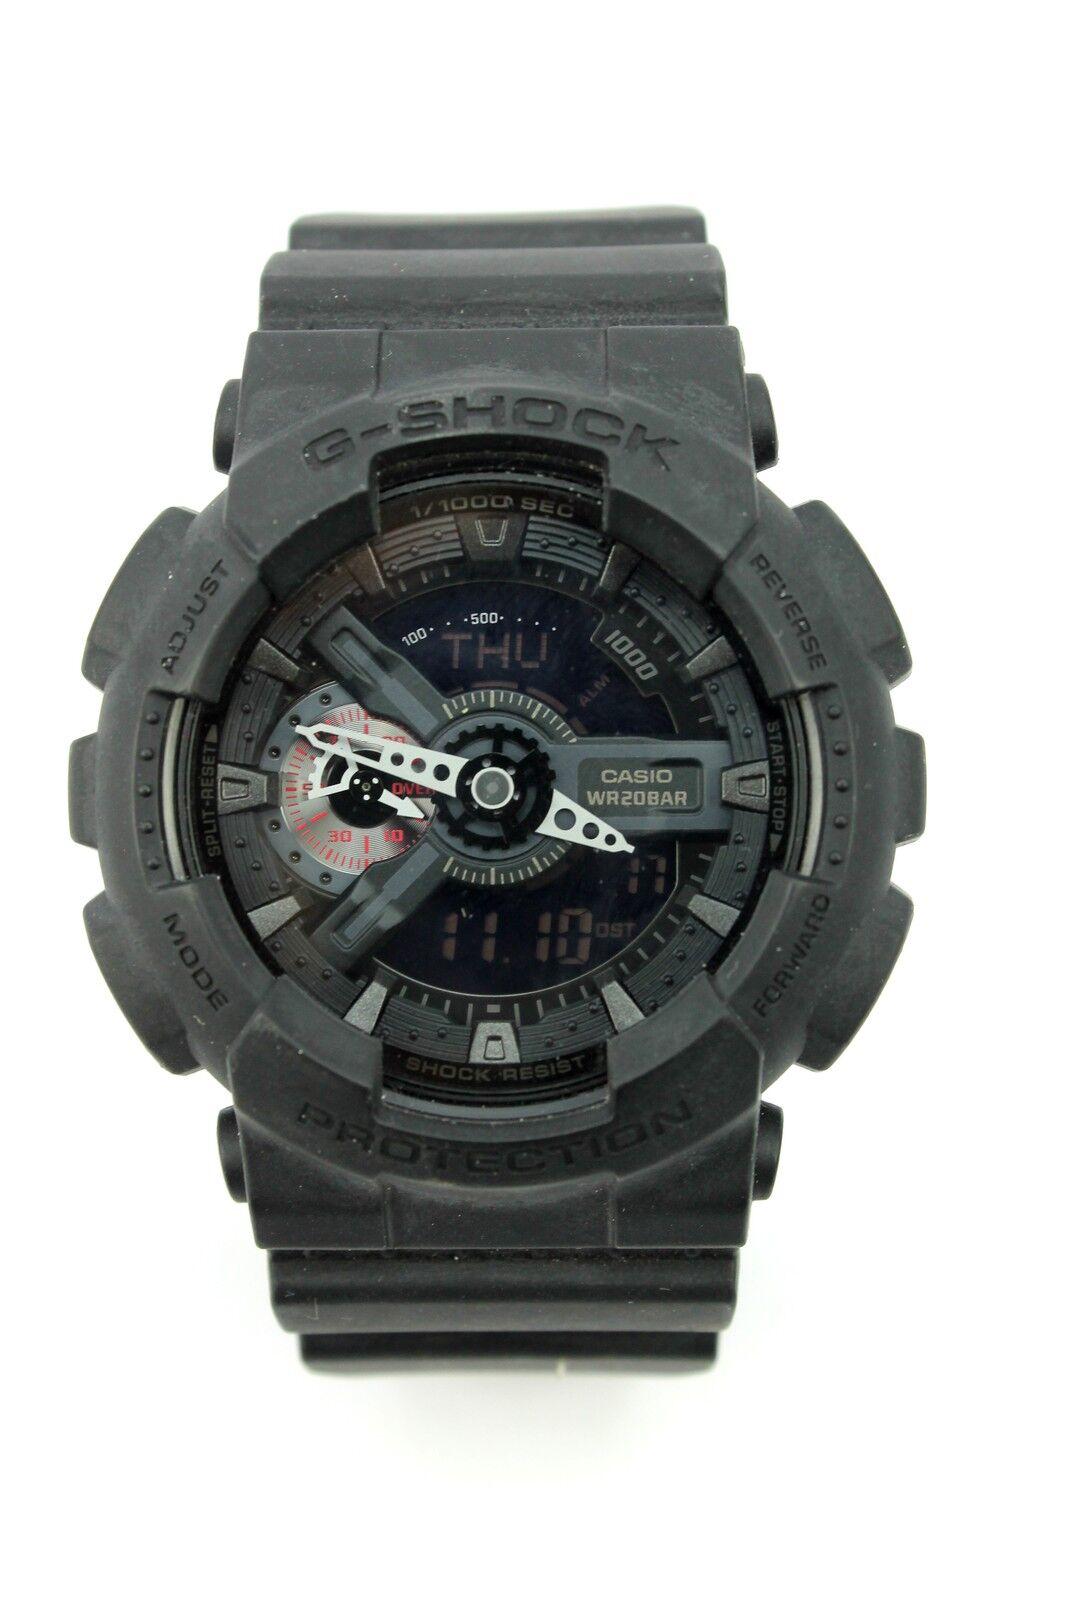 Casio 5146 G Shock Ga 110rg Mens Black Rose Gold Wr20 Bar Watch